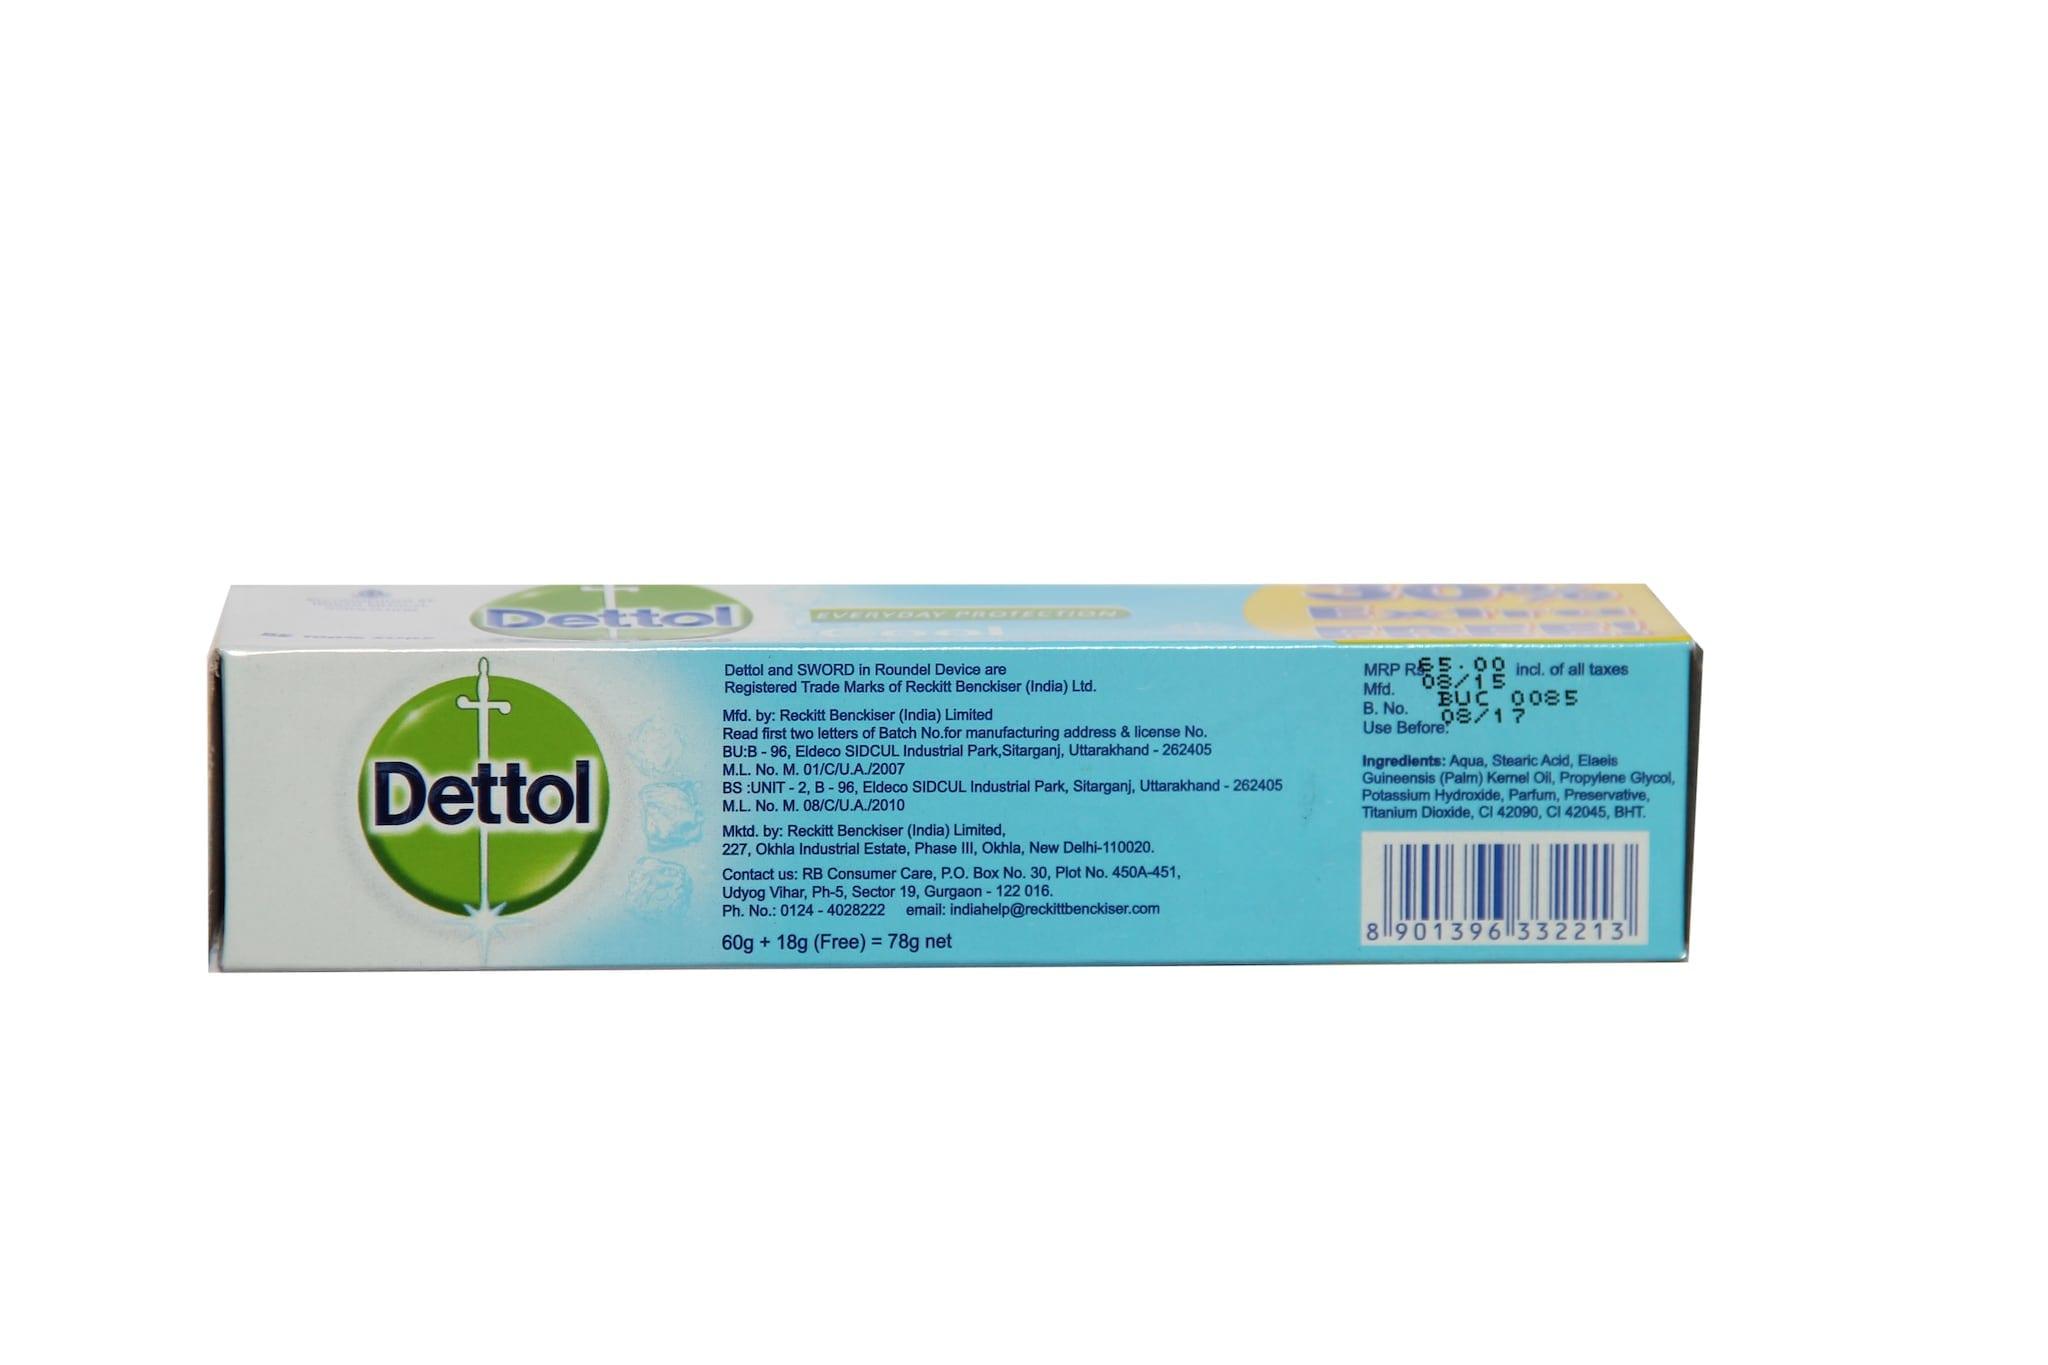 Dettol Cool Lather Shaving Cream 78 Gm